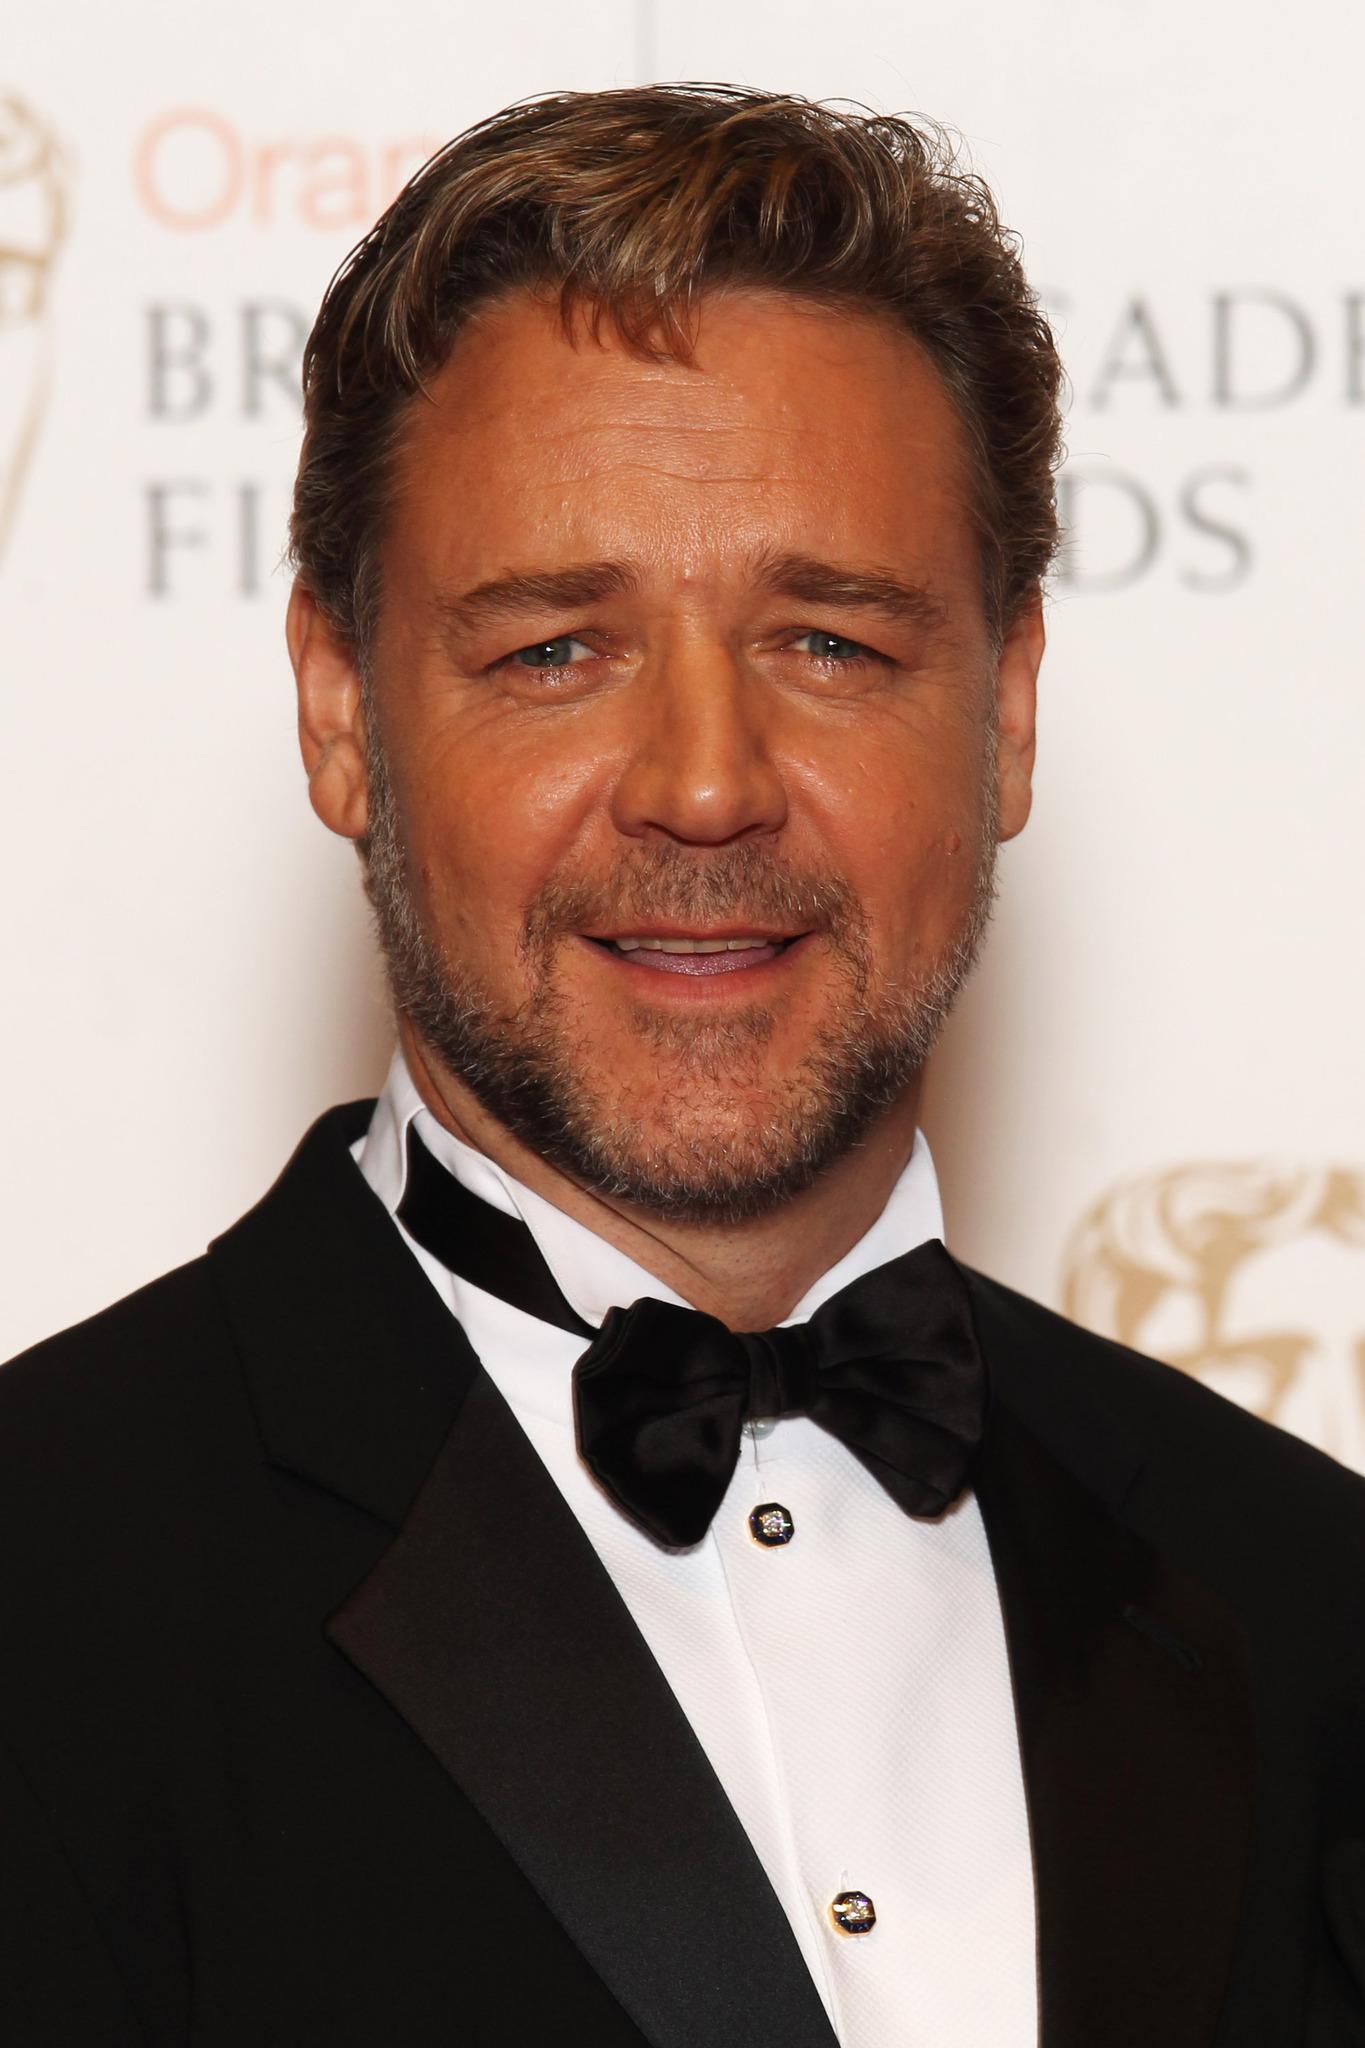 Russell Crowe Net Worth 2018, Bio/Wiki - Celebrity Net Worth